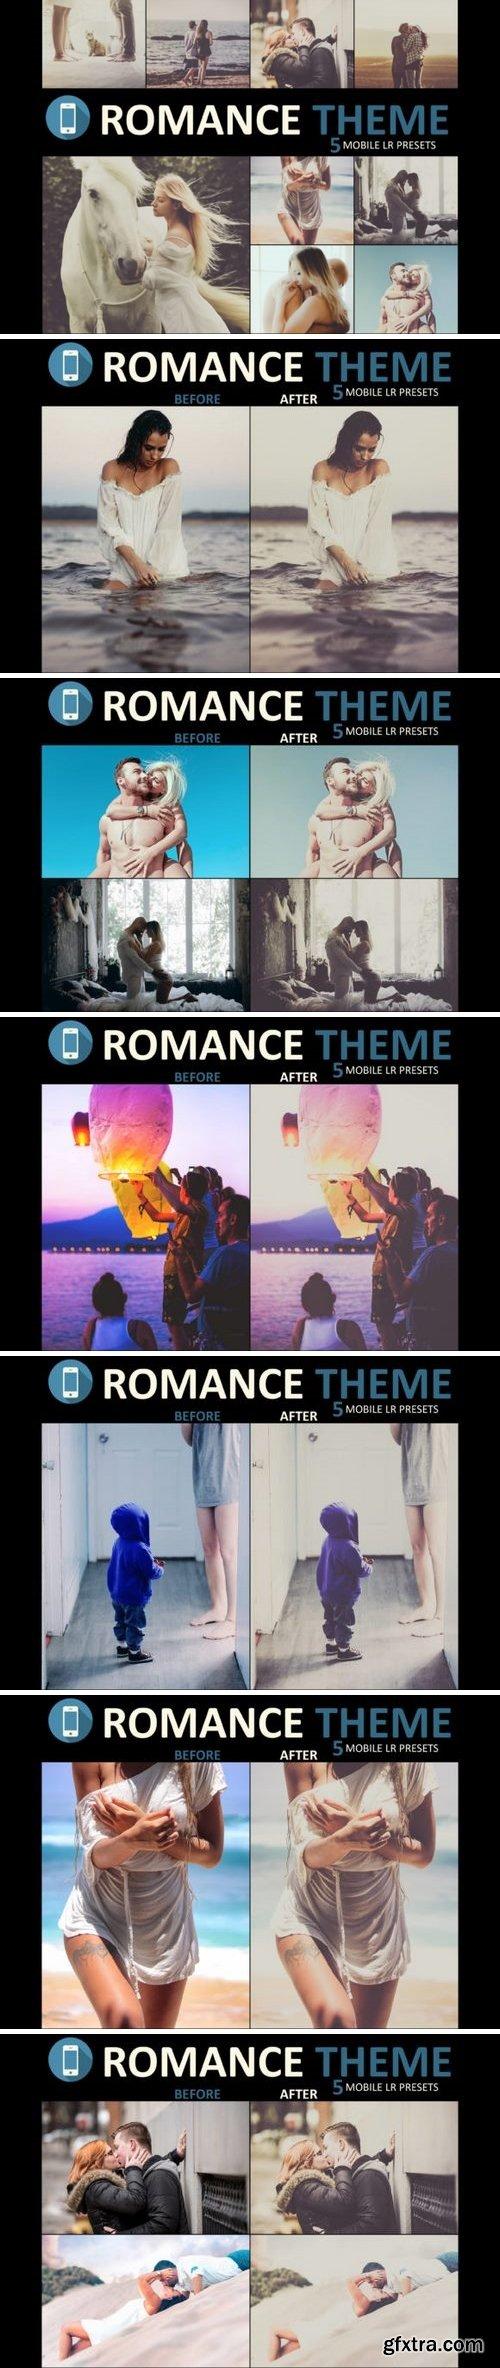 Thehungryjpeg - Neo Romance mobile lightroom presets theme 3522576